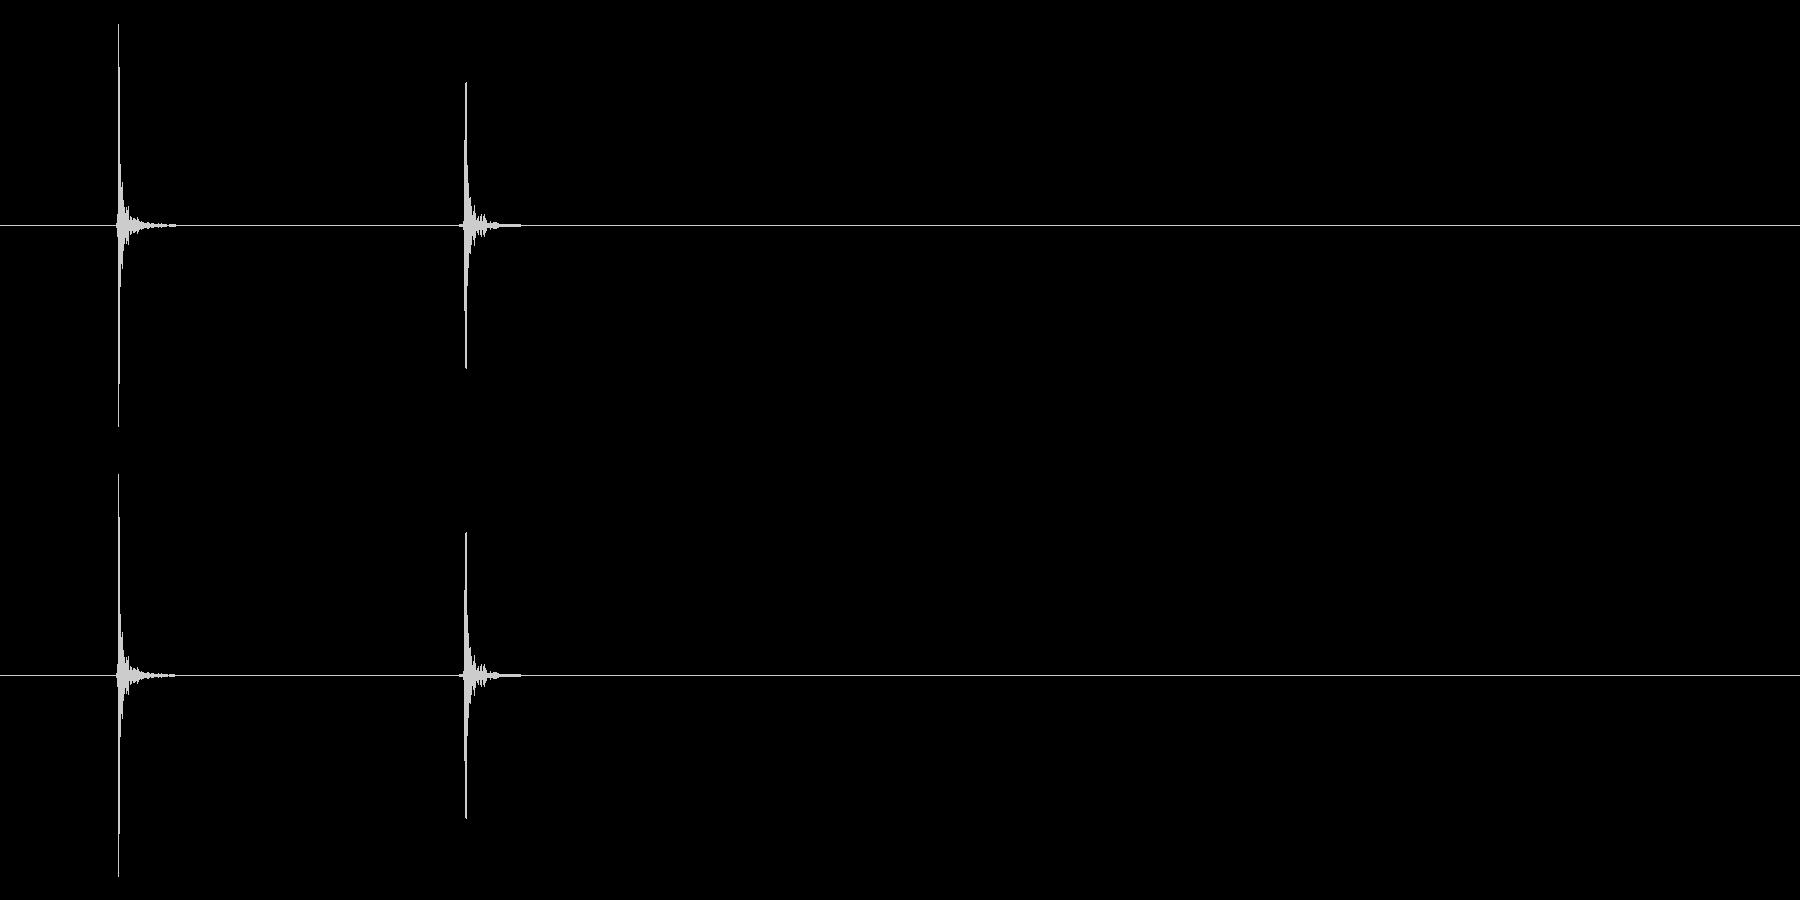 PC マウス02-09(右)の未再生の波形